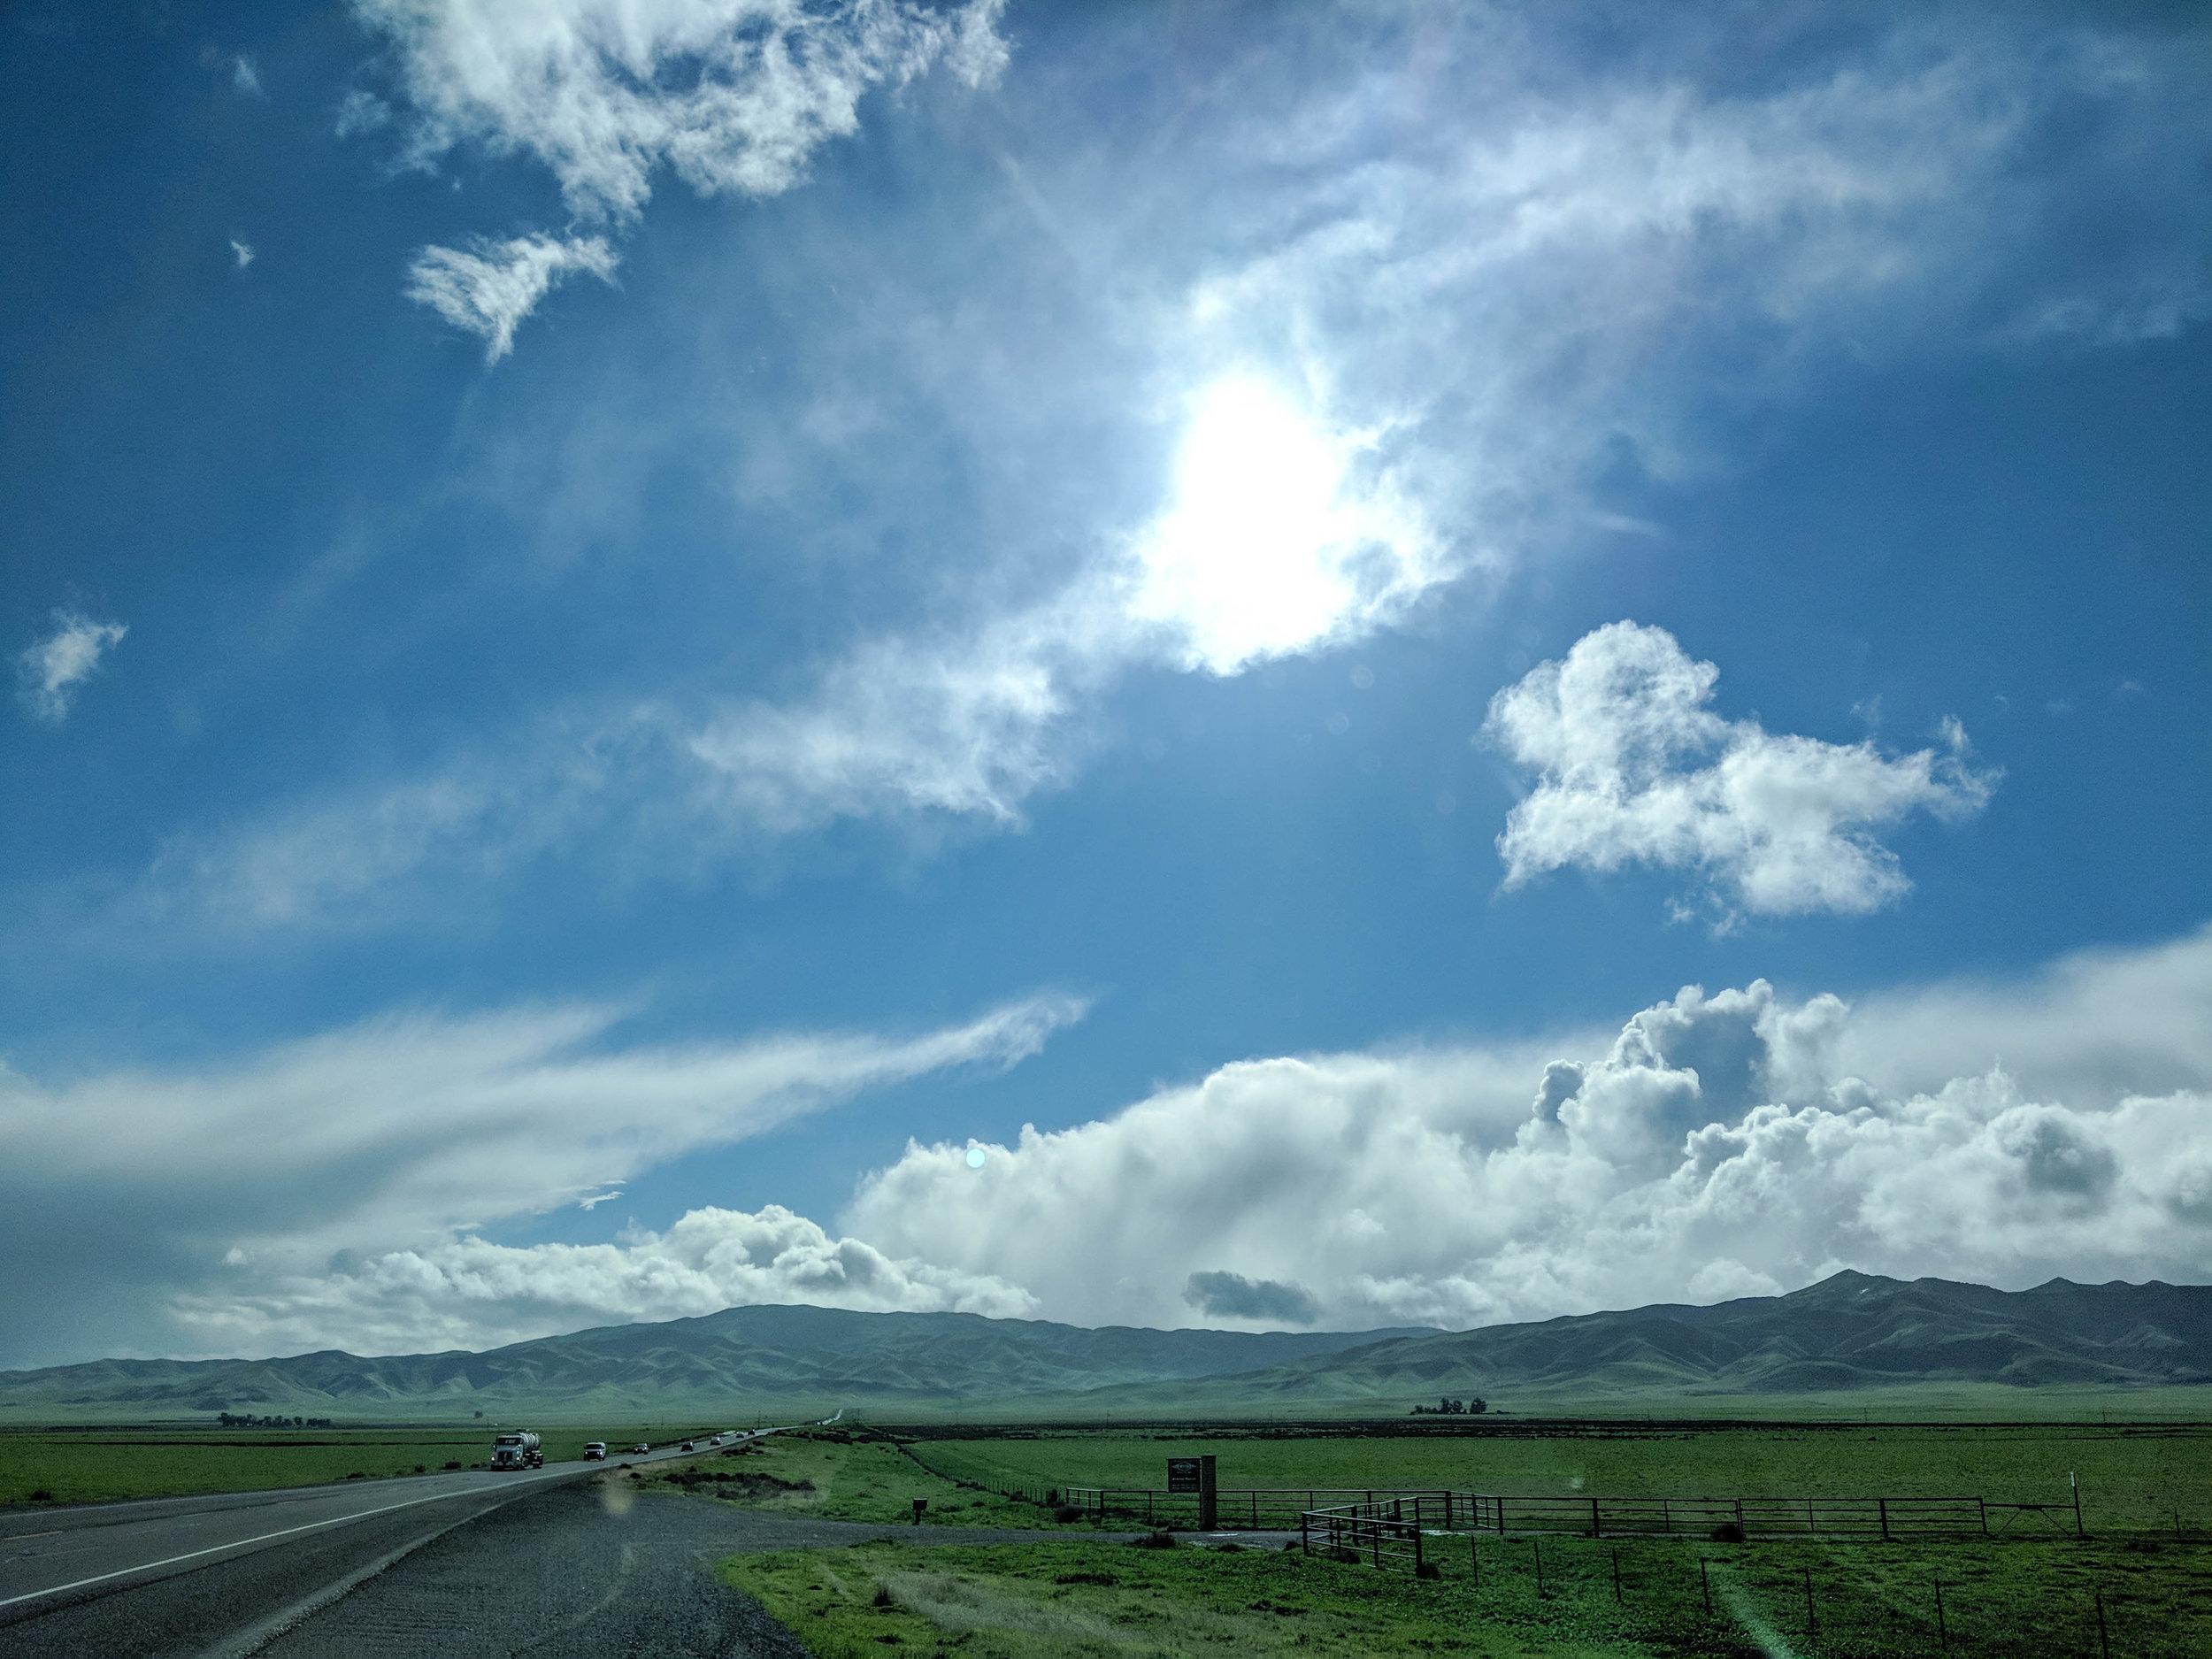 bri rinehart; photography; california; skies; clouds